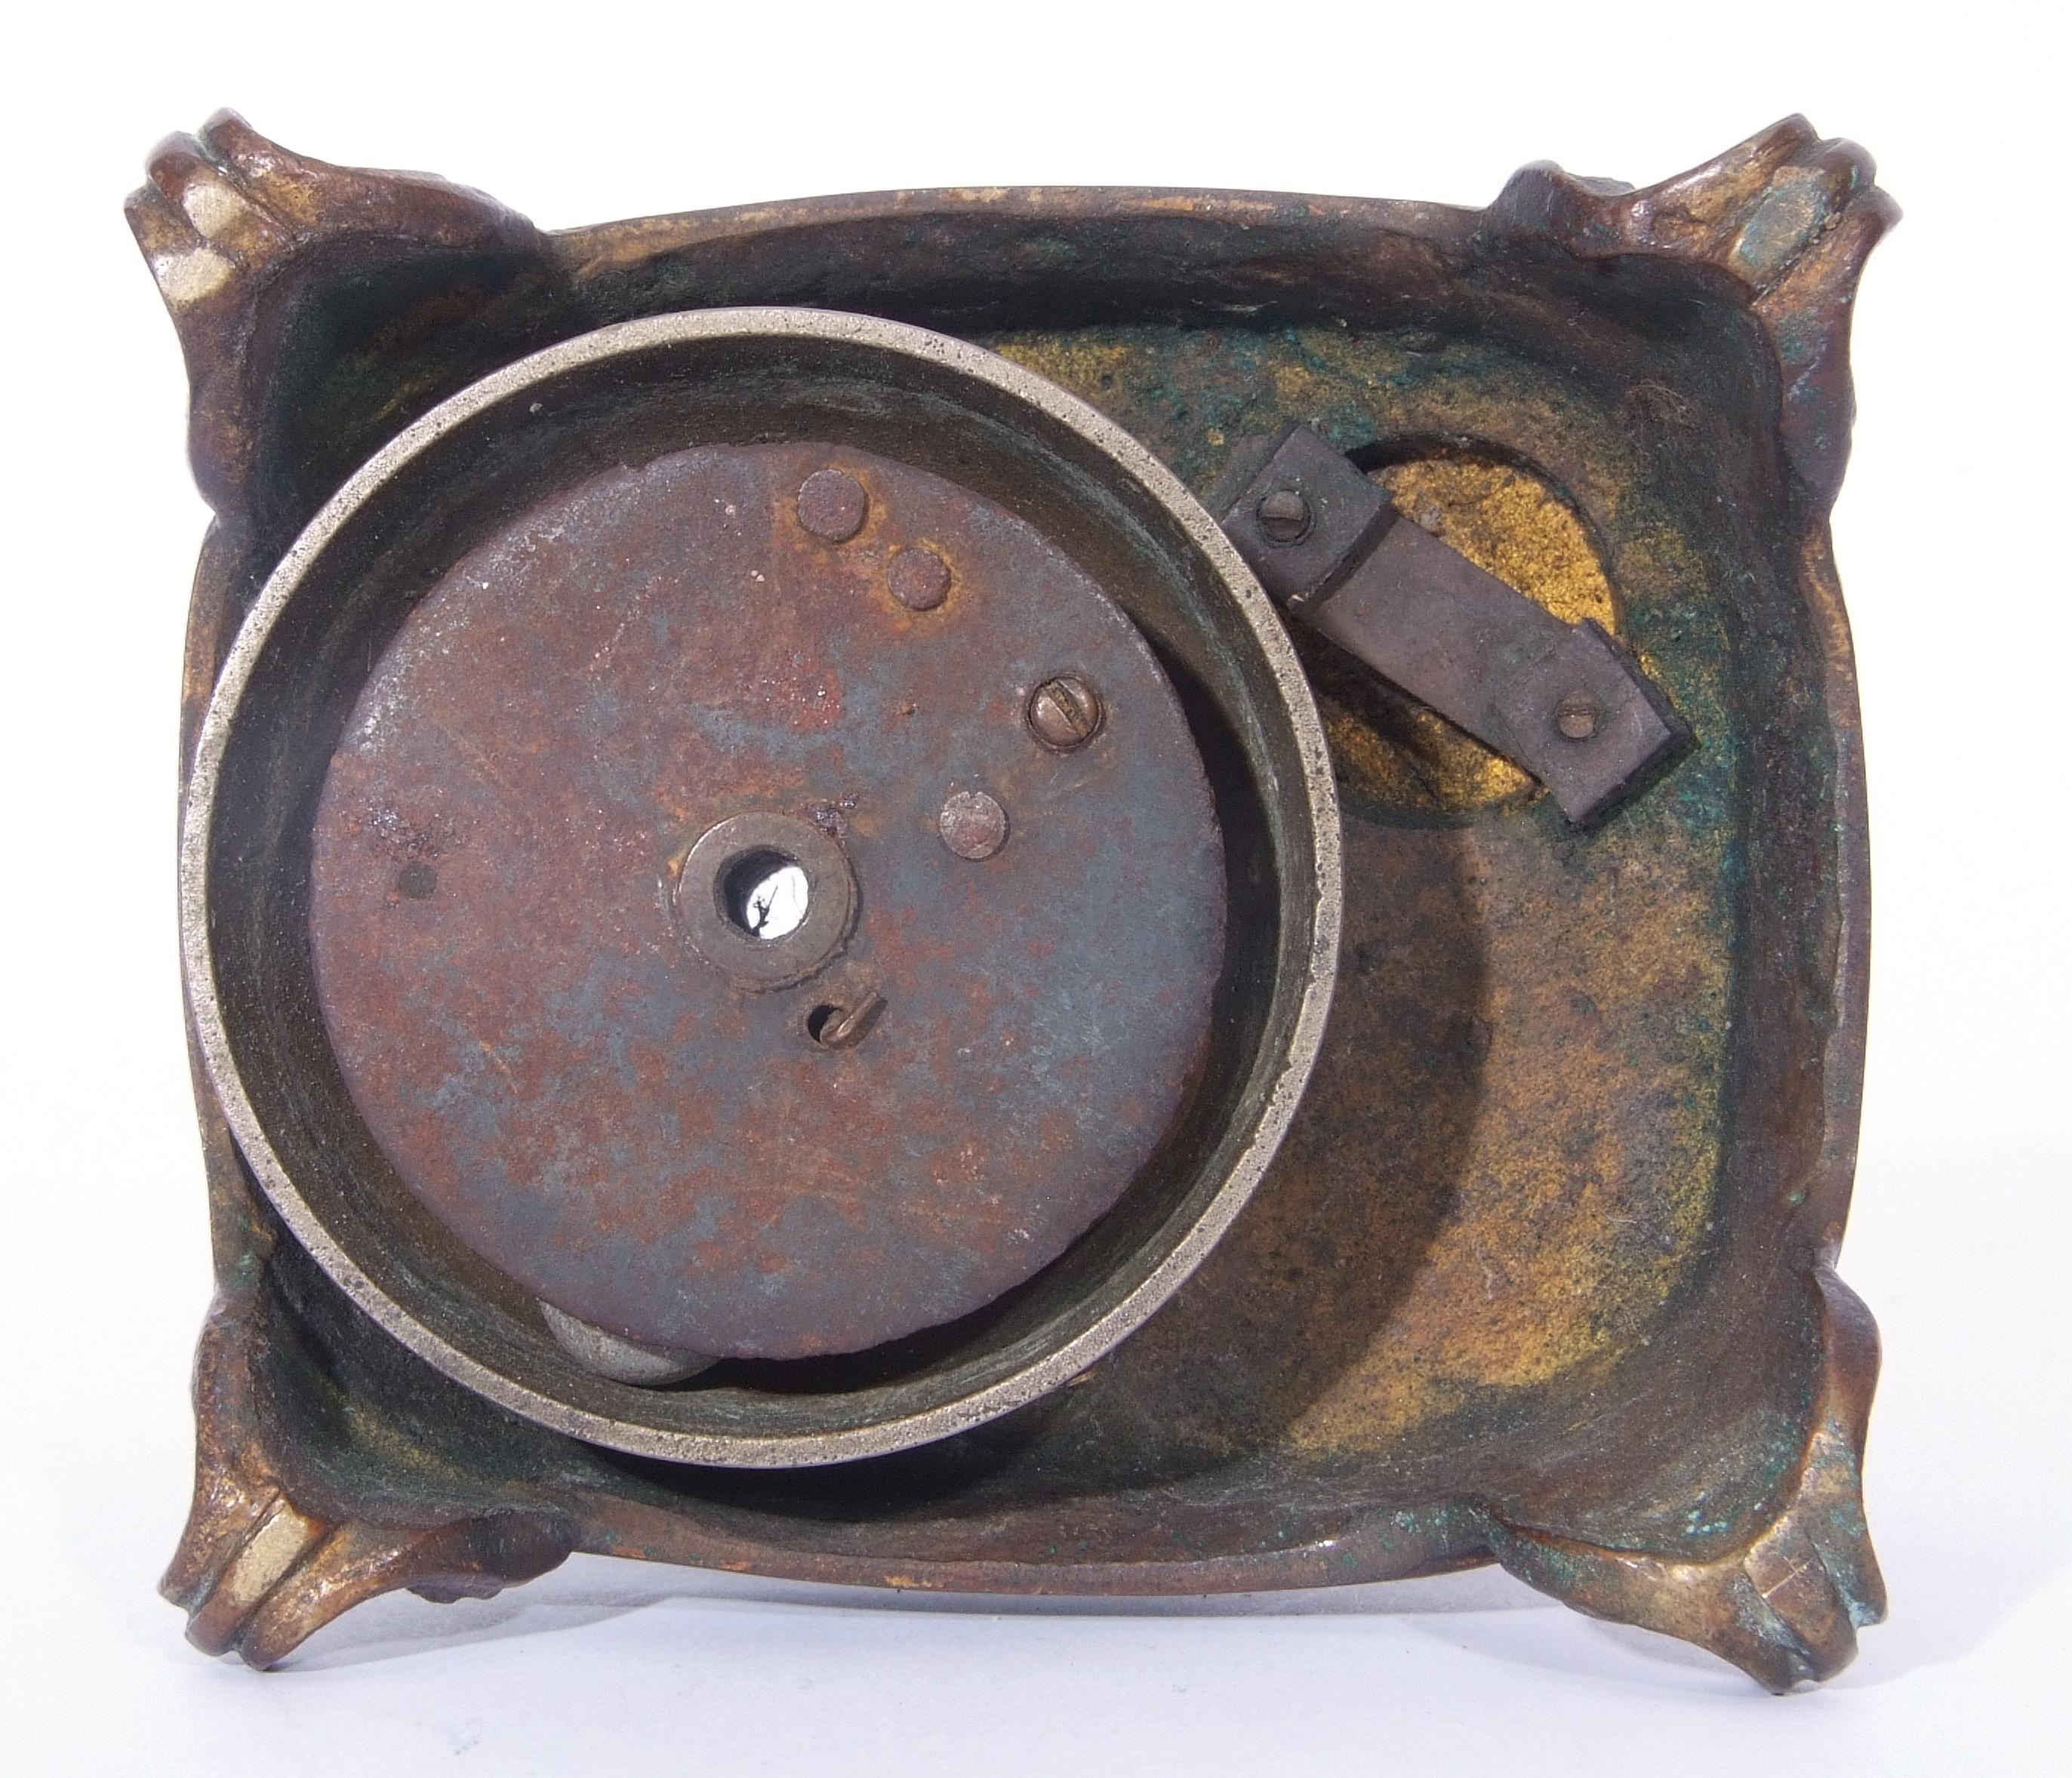 Antique bronze desk bell, a model of a monkey - Image 3 of 11